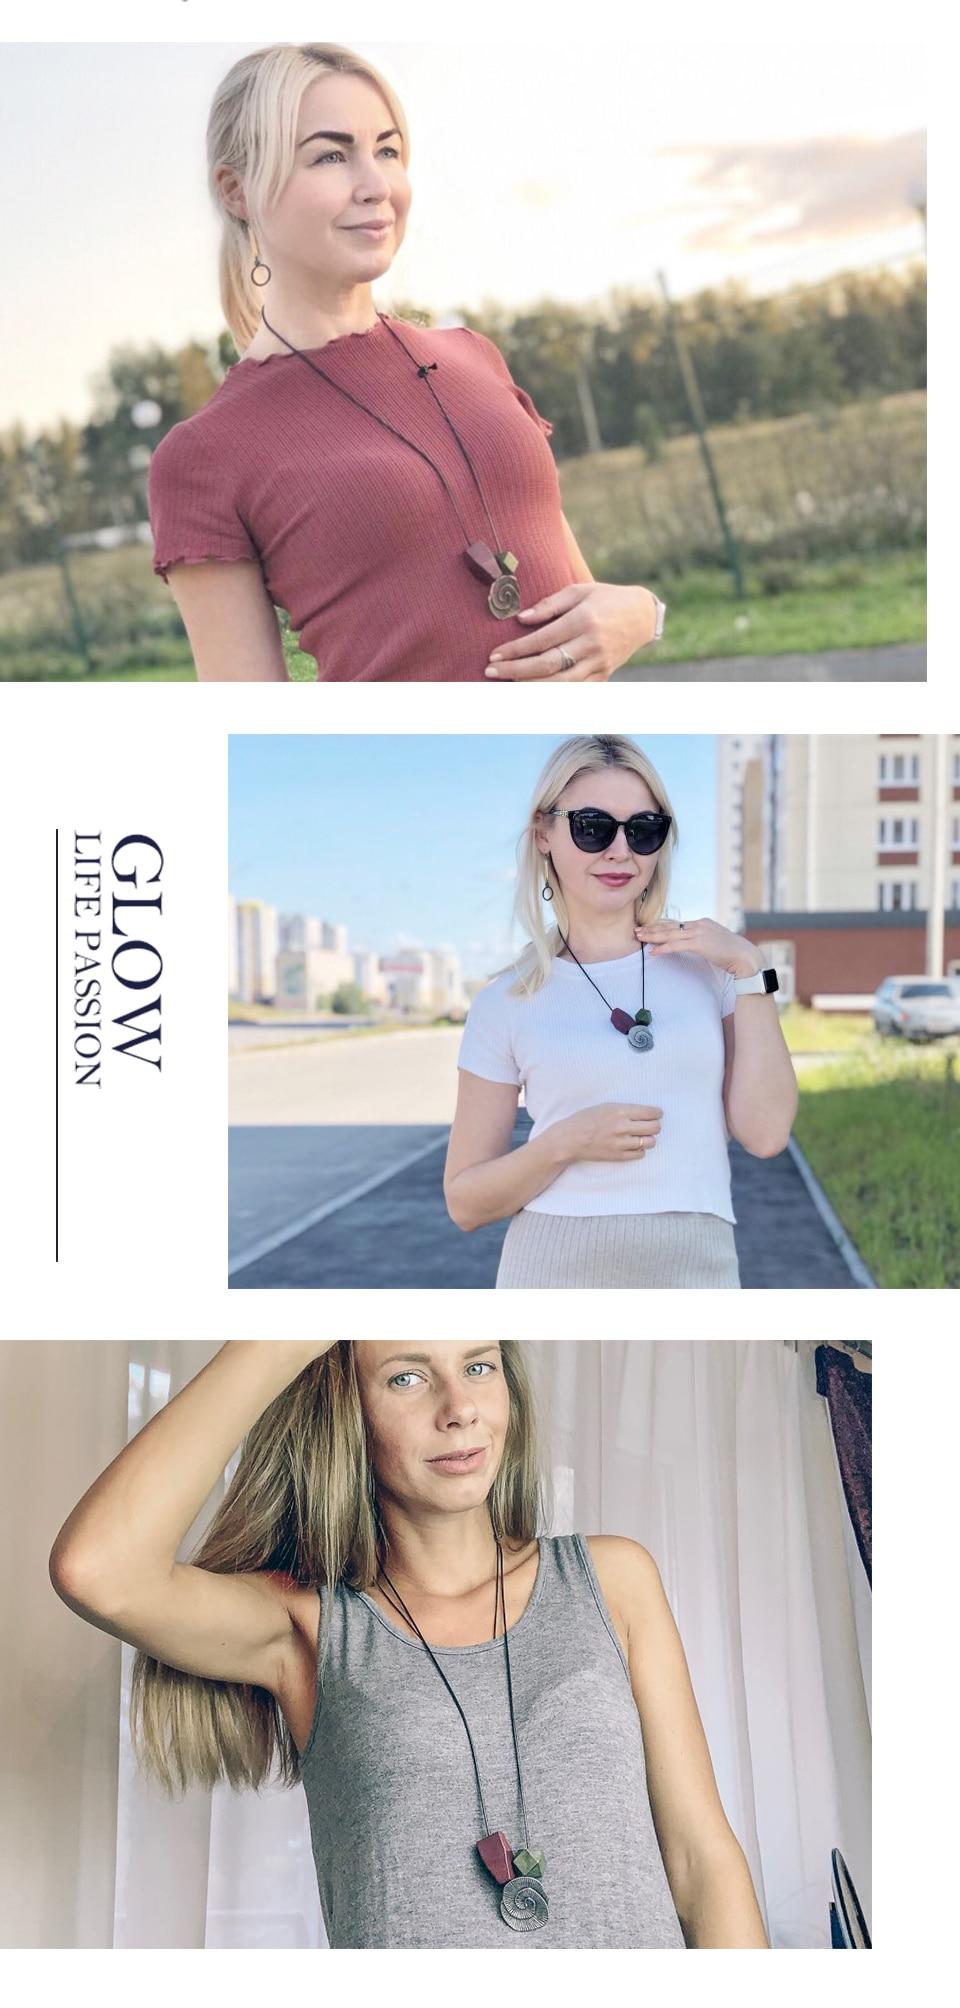 Vintage Necklaces & Pendants Handmade Statement Necklace Rop Pendant Festival Present For Friends Fashion Jewelry 2019 3.5*7.5cm